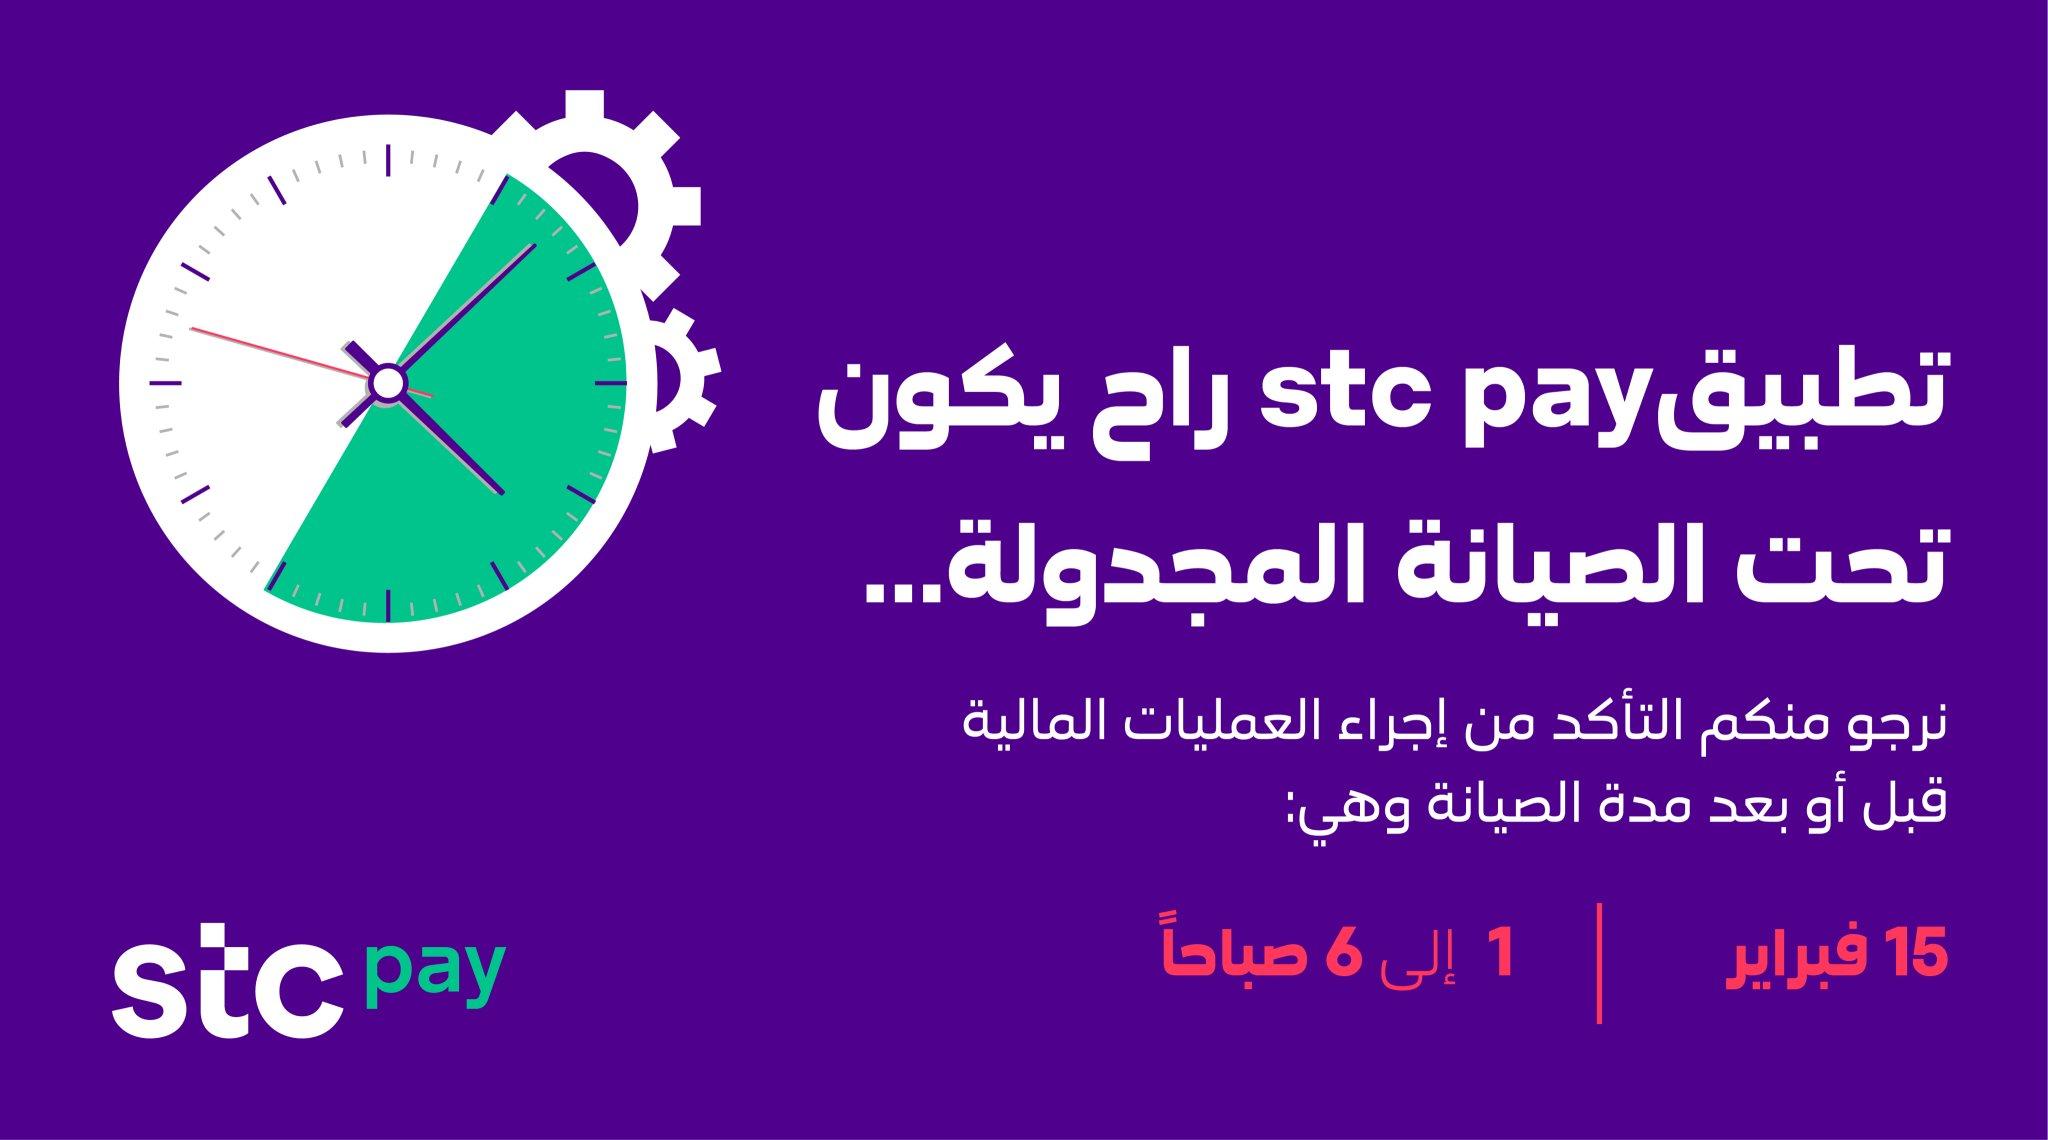 رقم خدمة عملاء Stc Pay